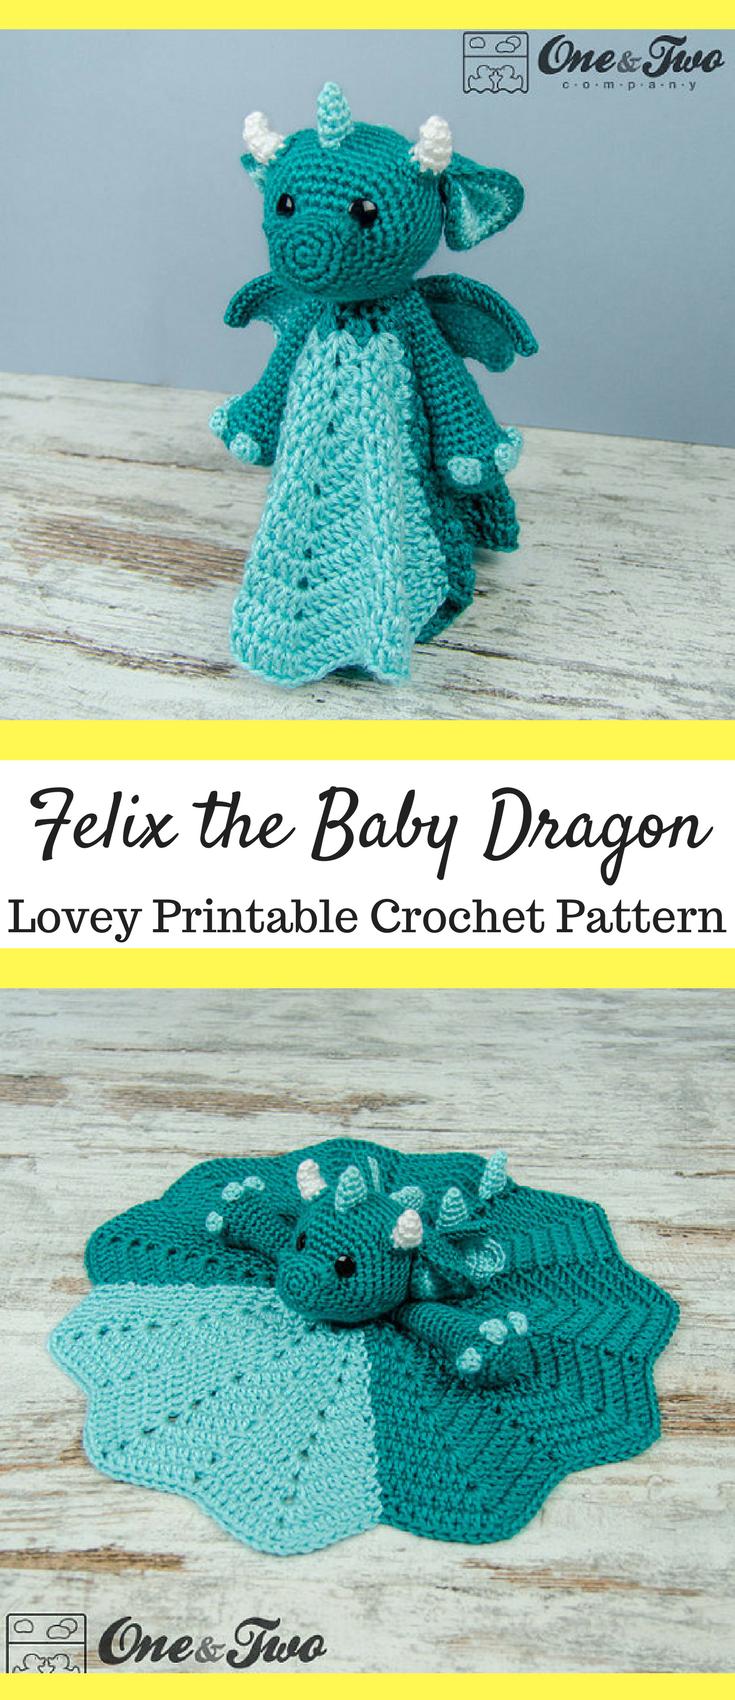 Amigurumi Baby Dragon Crochet Pattern Video Tutorial | 1700x735